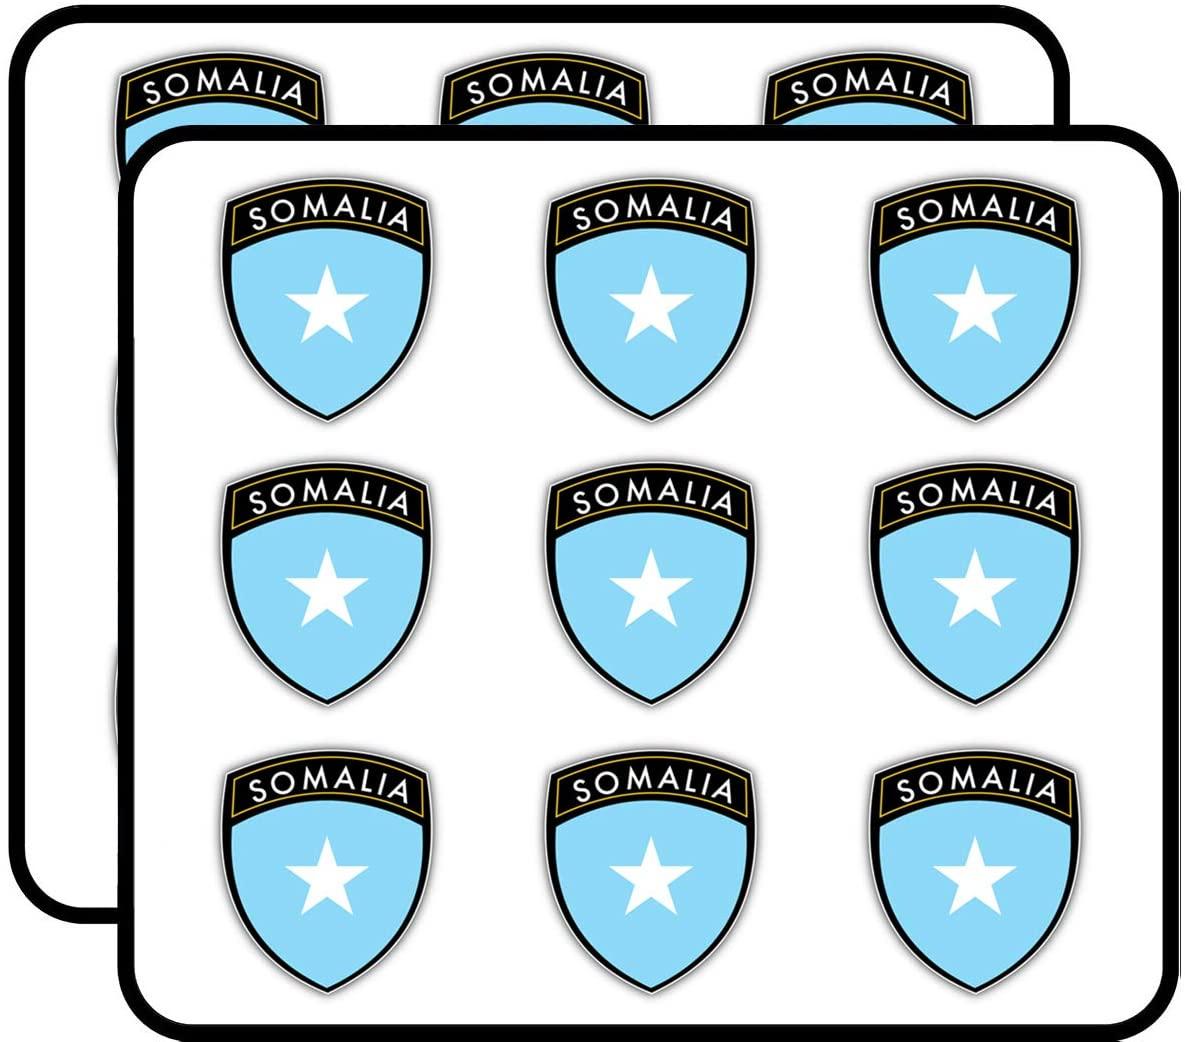 Somalia Flag Shield Label Art Decor Planner Calendar Scrapbooking Crafting Stickers 2